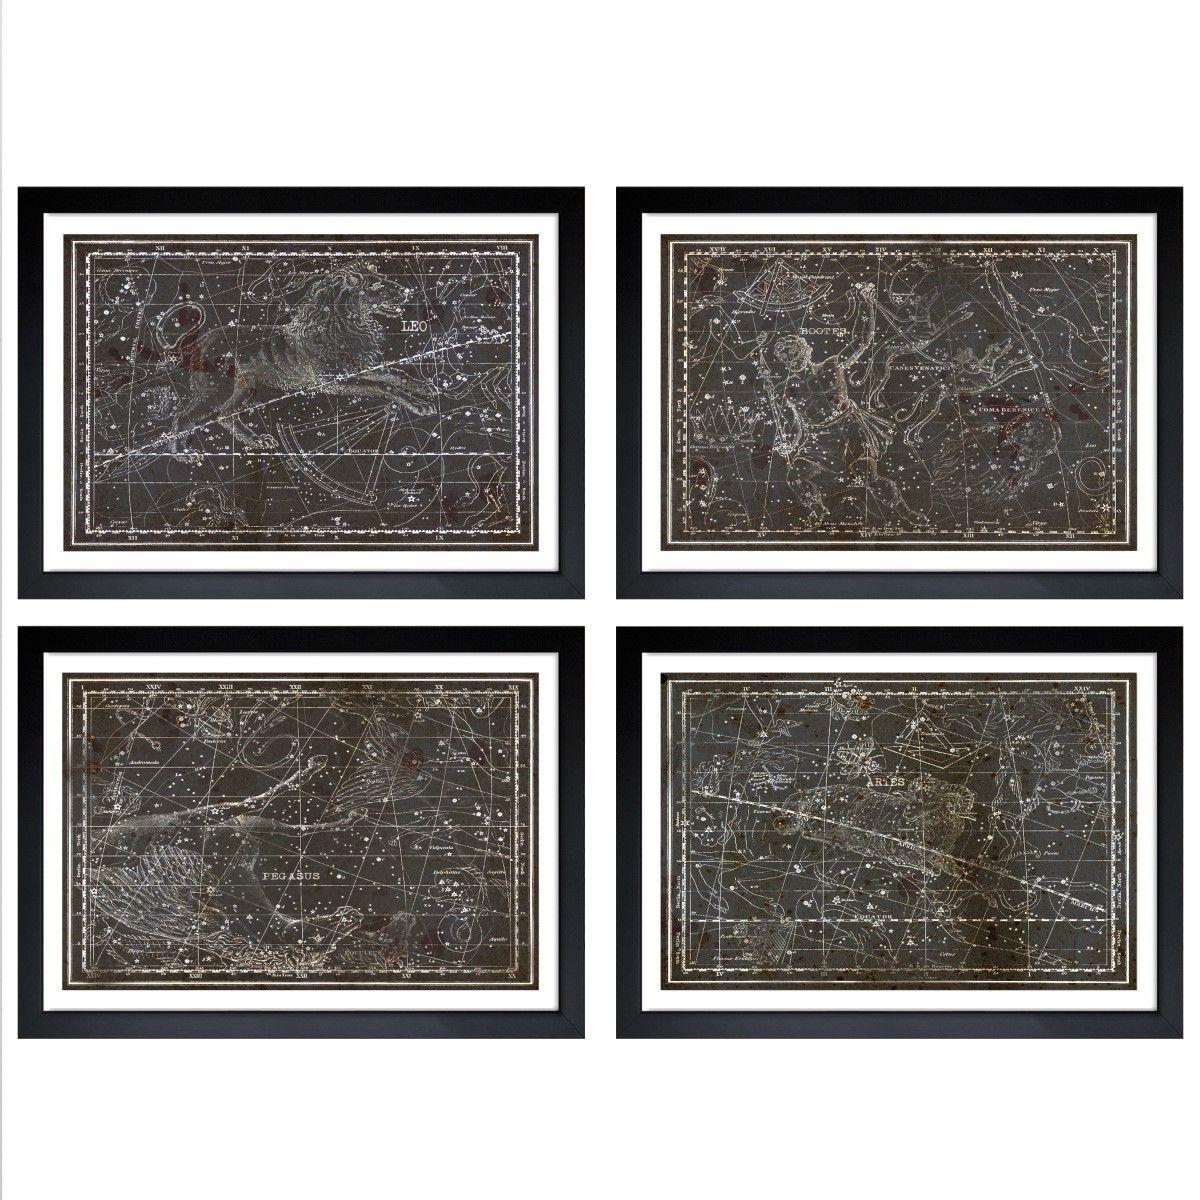 Oliver Gal 'Celestial Map XVI Century - 4 Panels' Framed Art | Overstock.com Shopping - The Best Deals on Prints